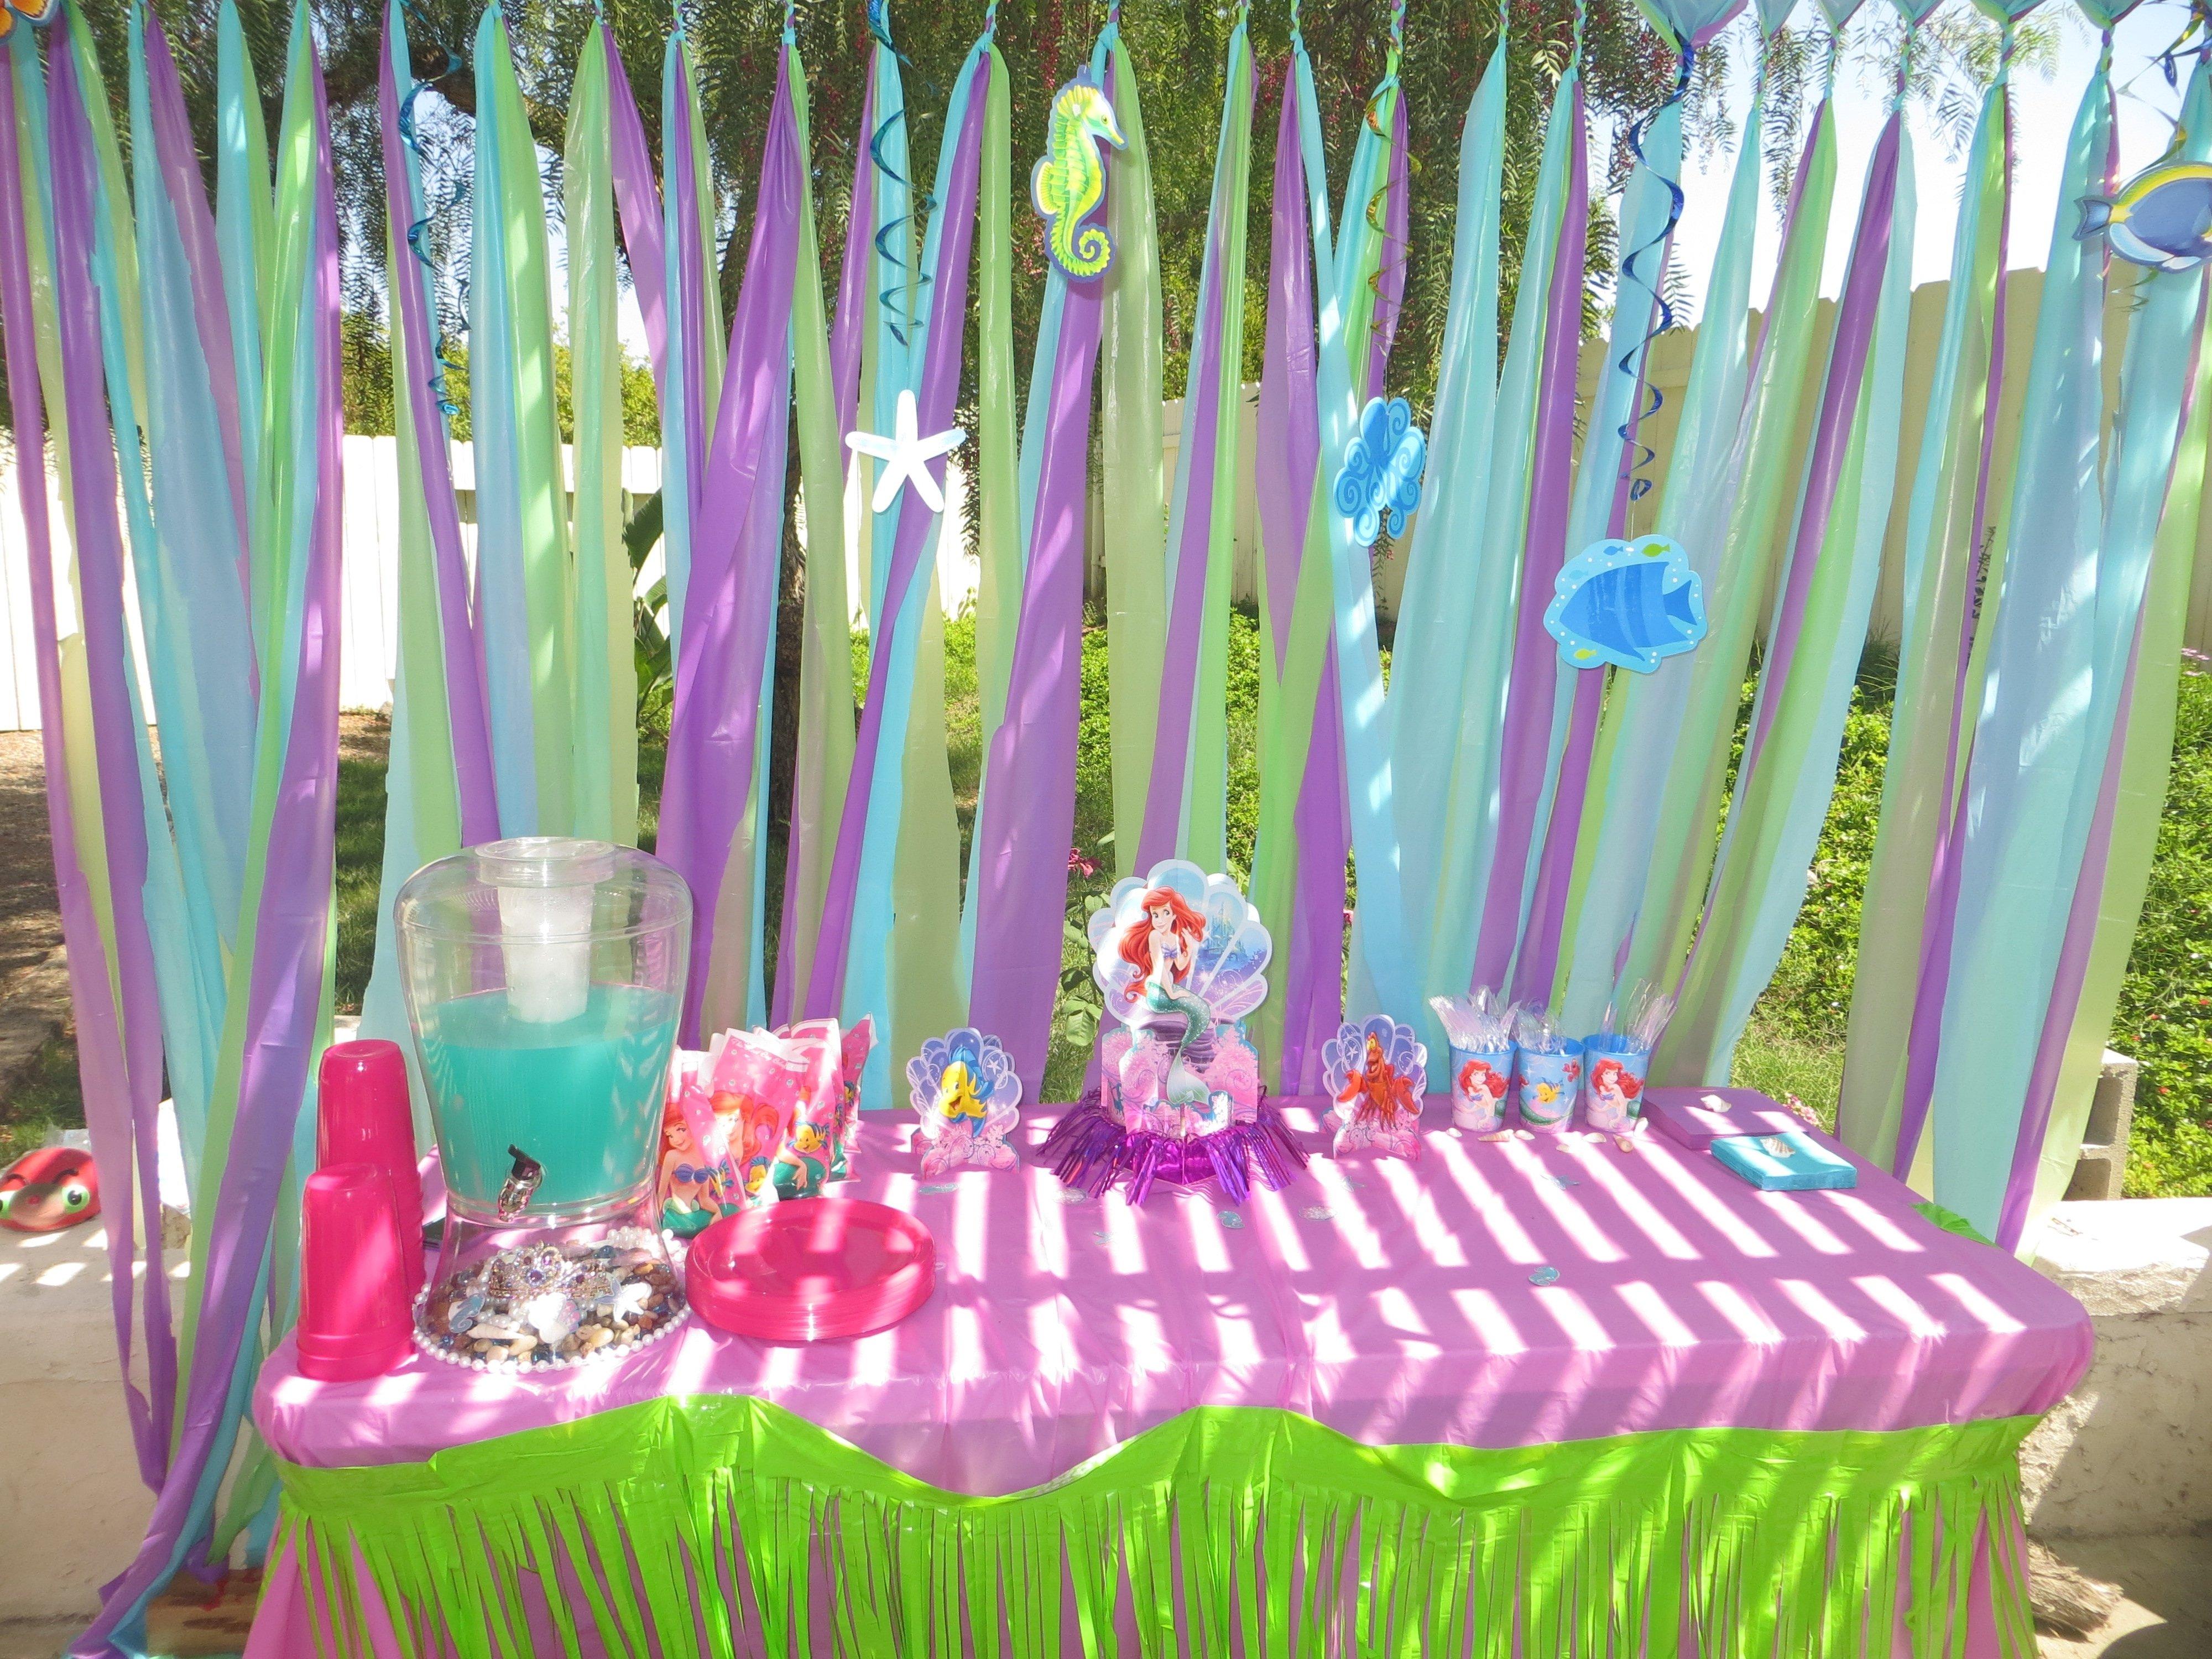 10 Great The Little Mermaid Birthday Party Ideas little mermaid party decoration ideas diy cute ideas 2021